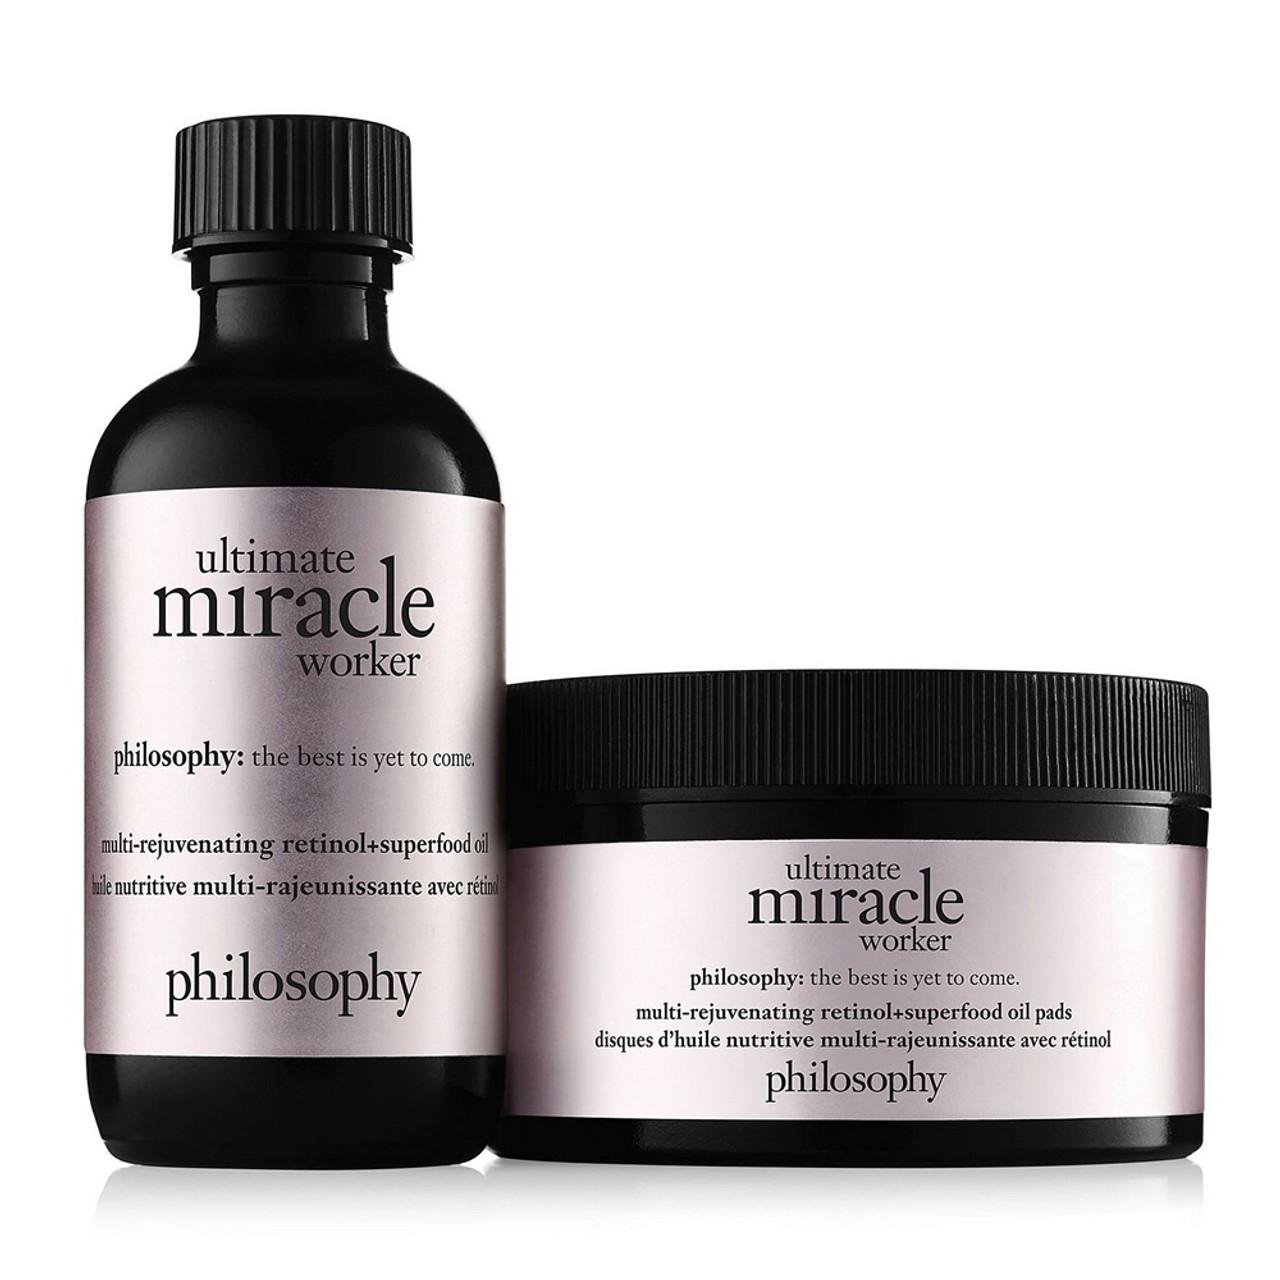 philosophy Ultimate Miracle Worker Multi-Rejuvenating Retinol+Superfood Oil Pads (60ct) BeautifiedYou.com